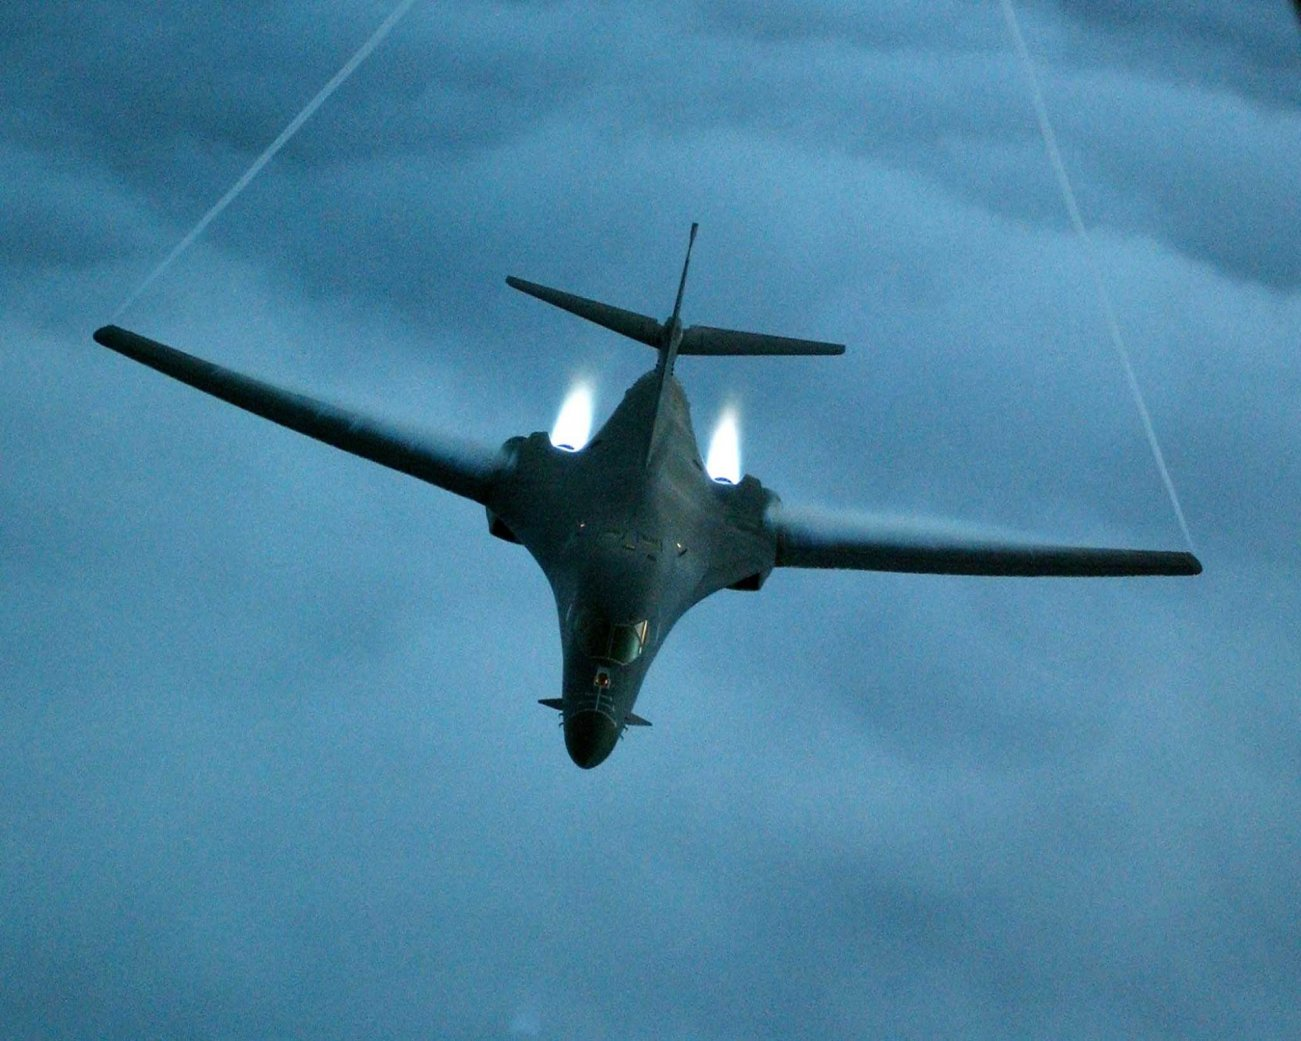 Secret Weapon: The B-1 Lancer Bomber Could Fly Under Enemy Radars?